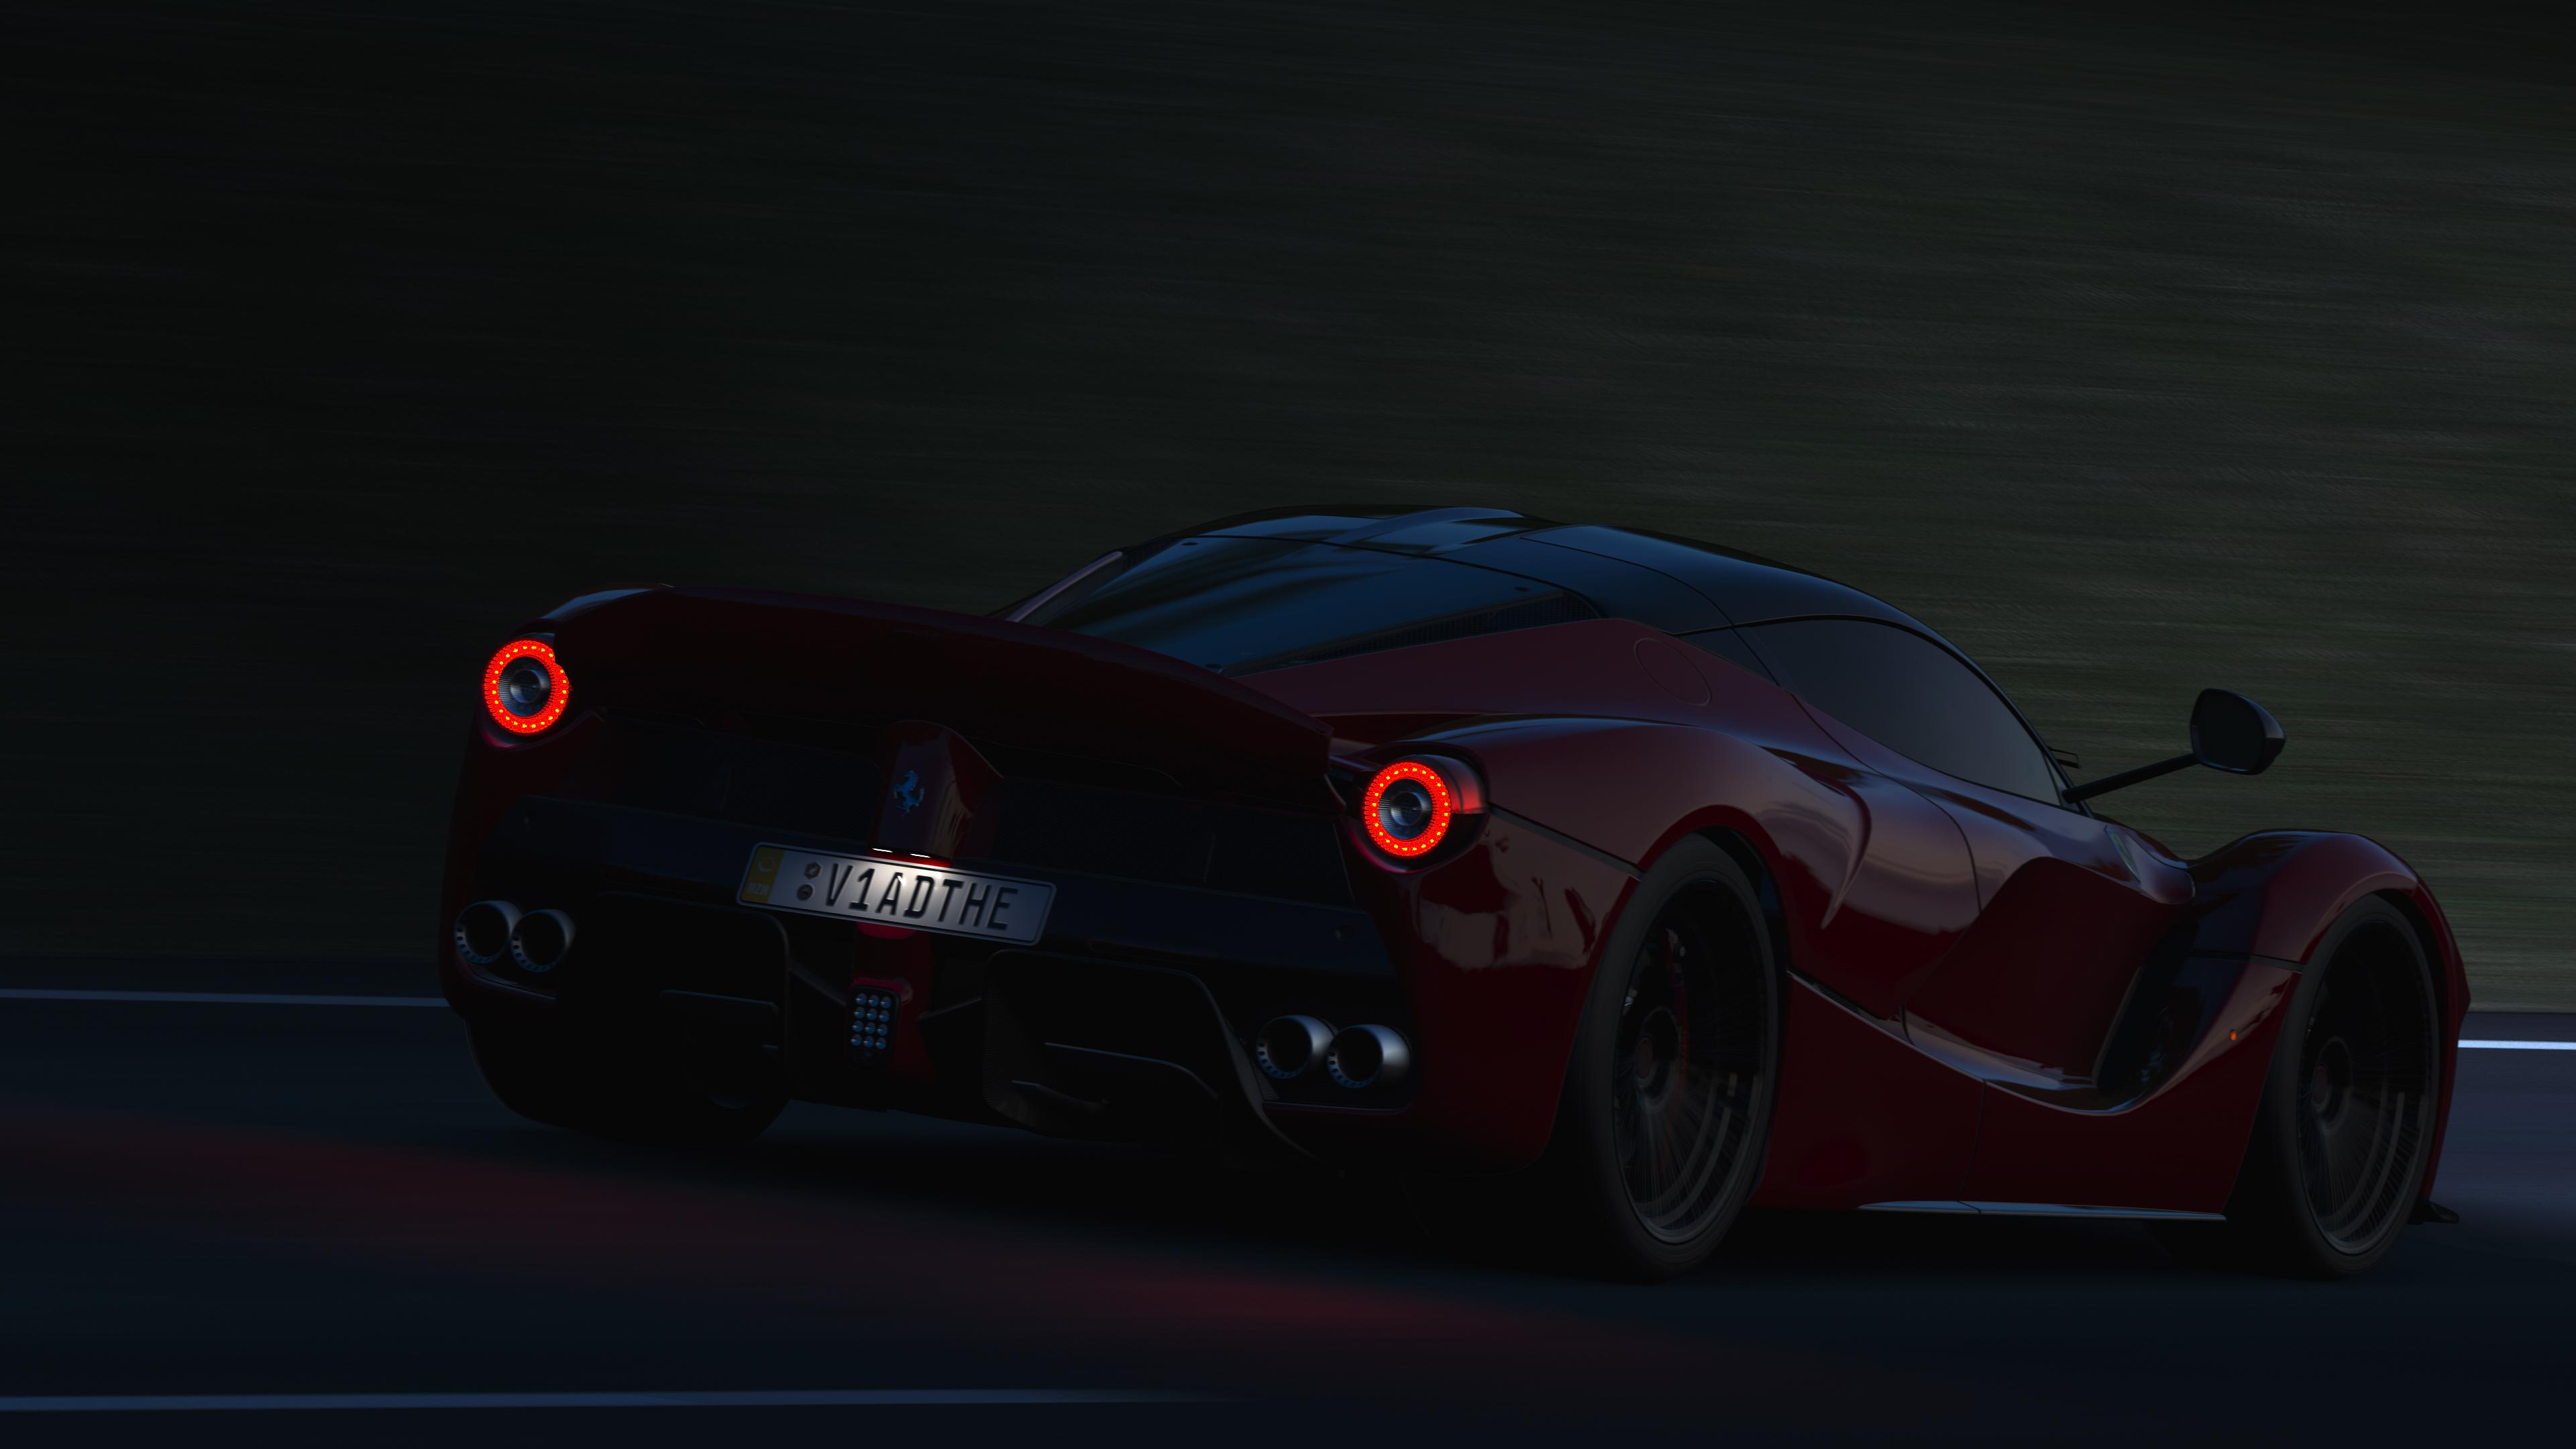 Forza Horizon 3 Ferrari, HD Games, 4k Wallpapers, Images